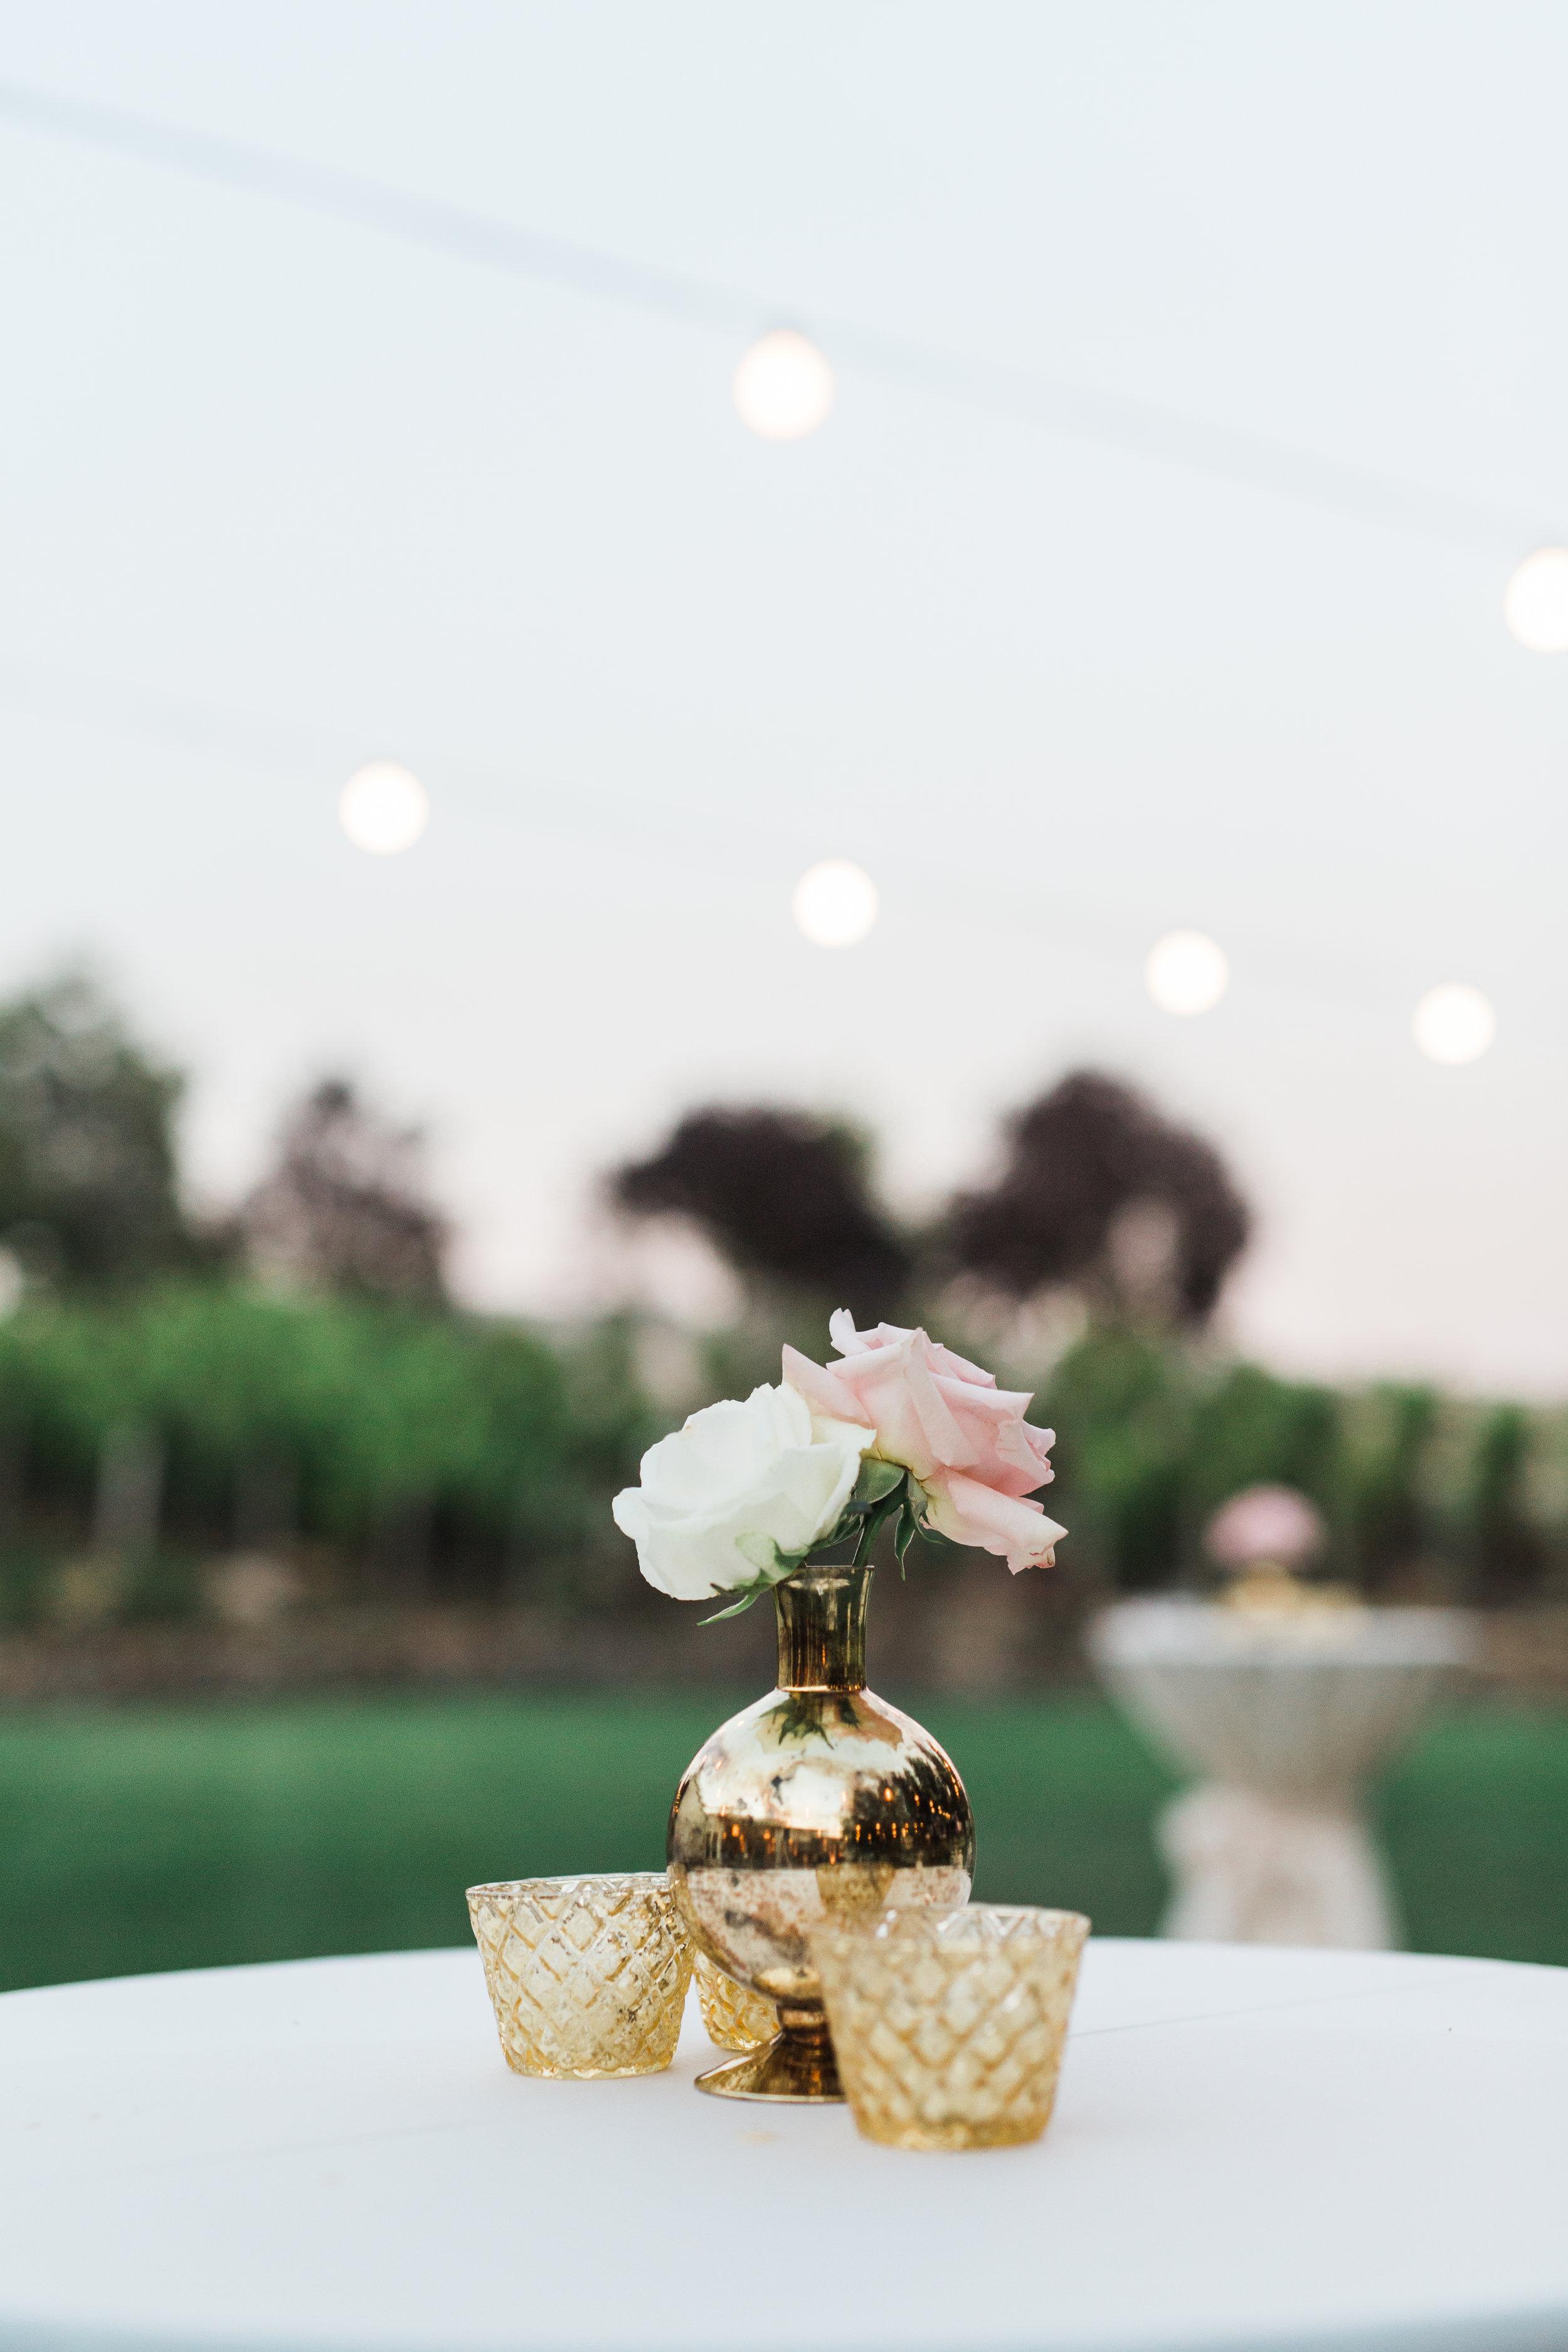 jenny-and-george-wedding-roque-events-meyerott-photography 1146.jpg